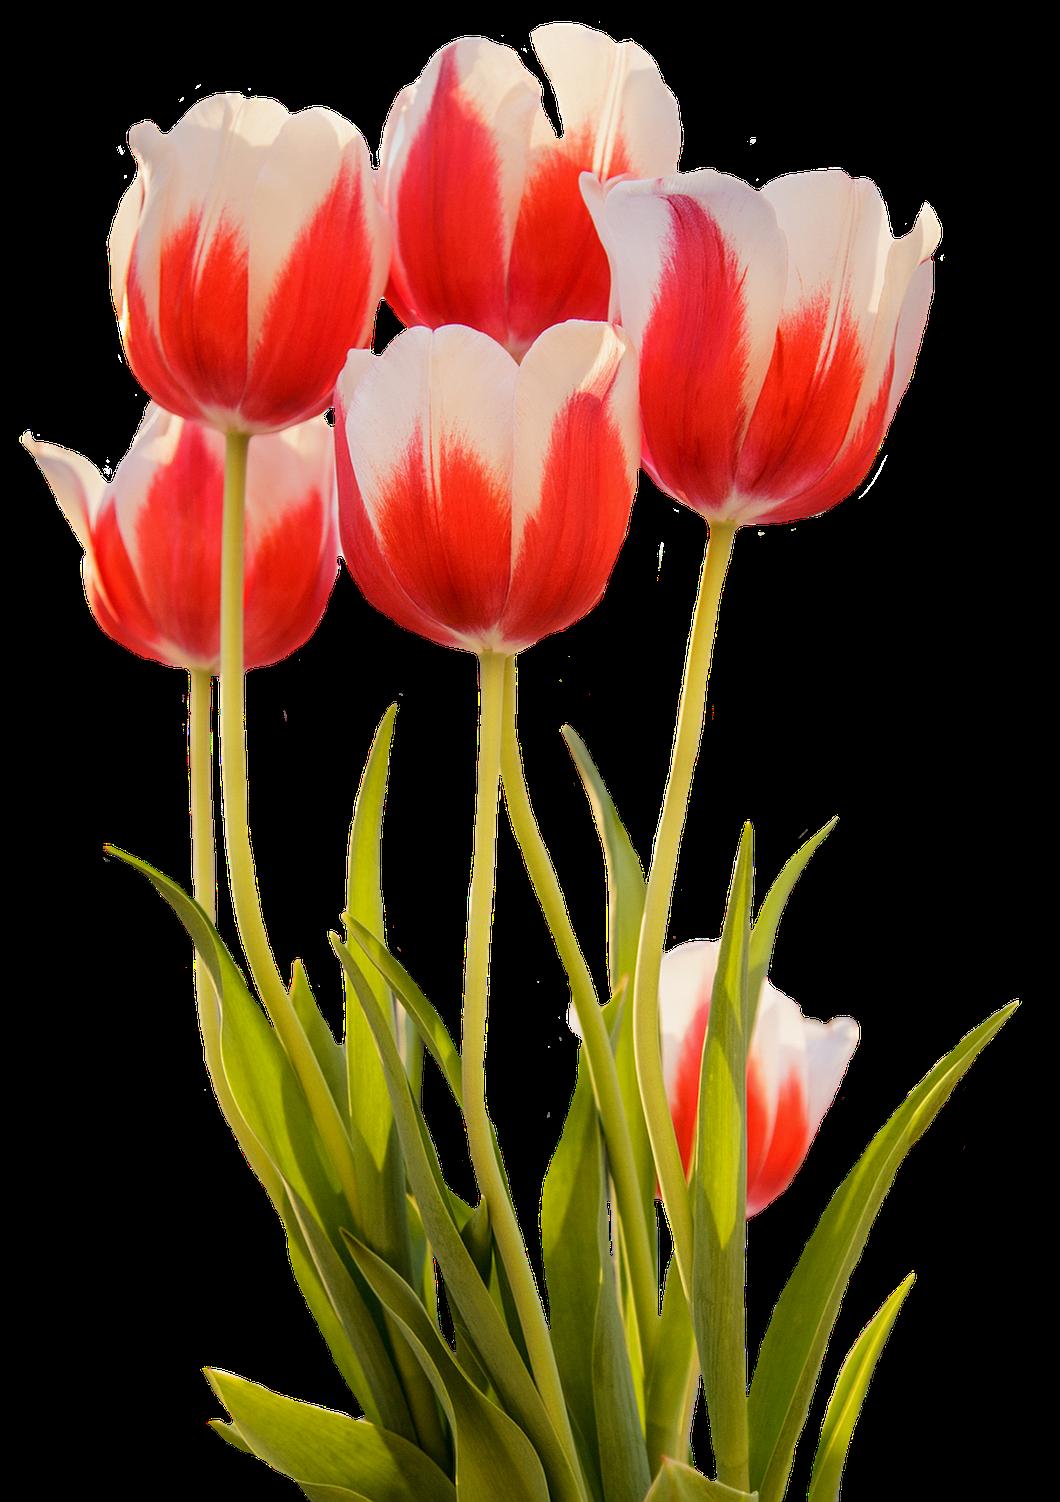 Pin By Regina Prevelato On Flores Spring Garden Flowers Spring Flowers Tulips